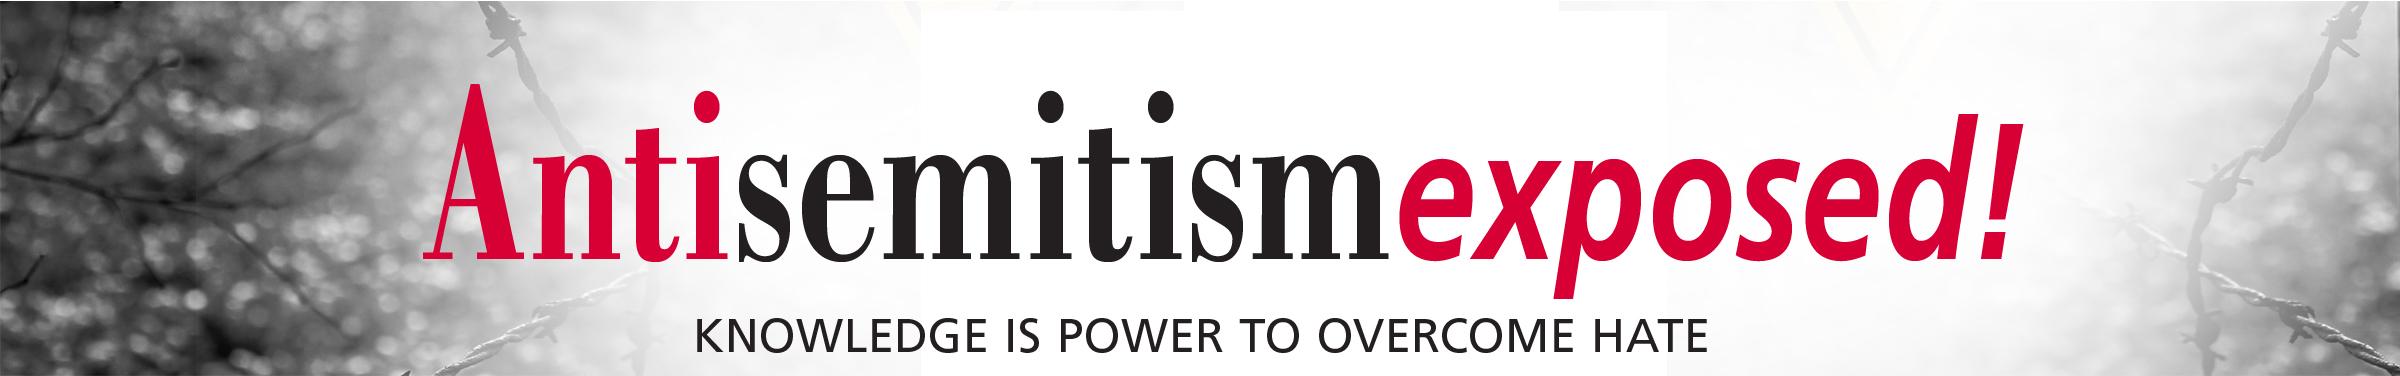 AntiSemitism Exposed!